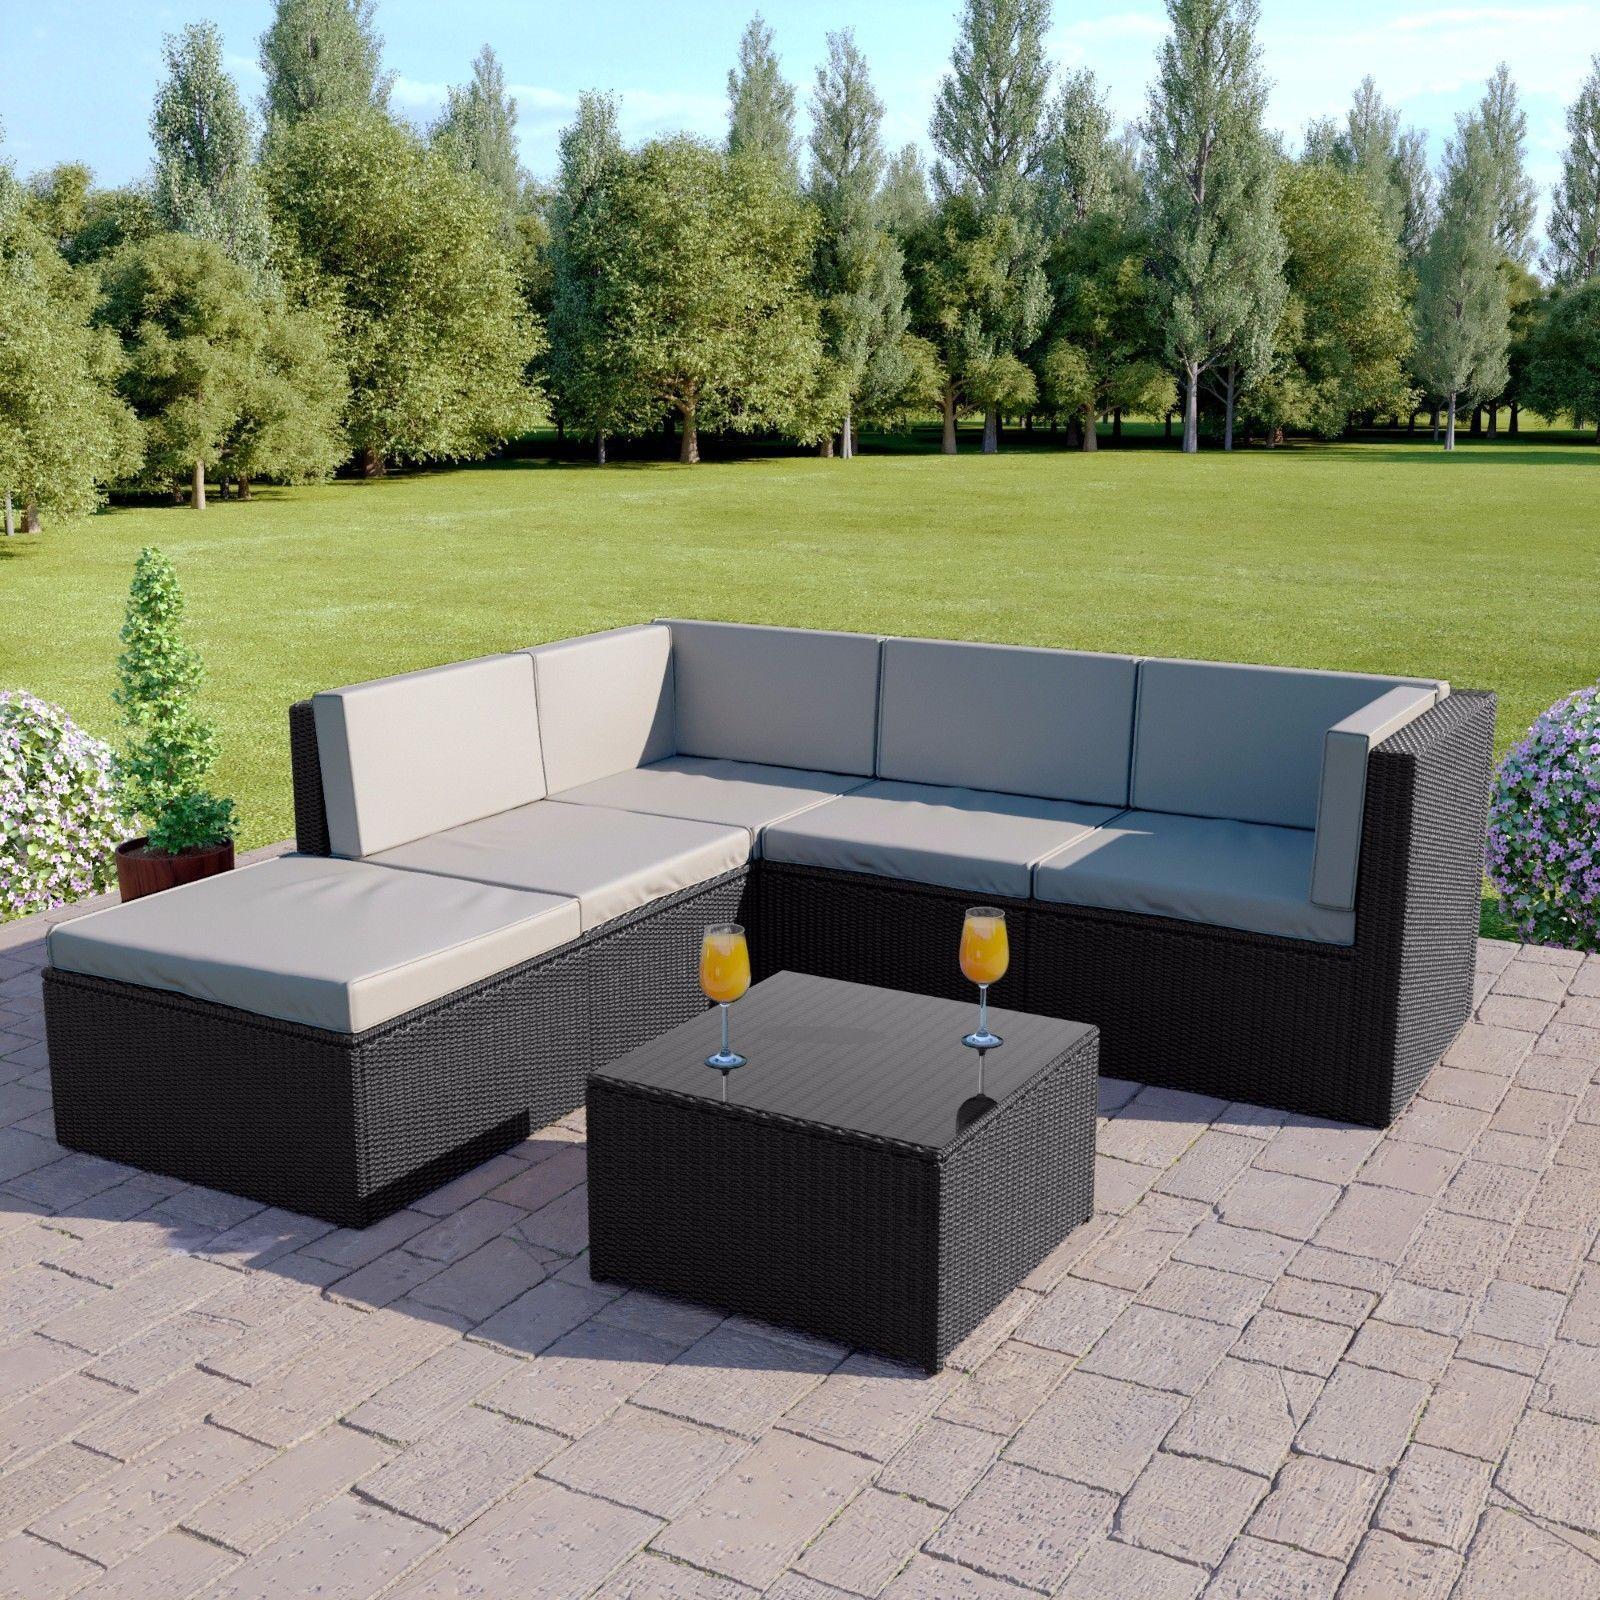 Details About Black Rattan Modular Corner Sofa Set Garden Furniture L Shape Free Cover E Ercis Com Decoration Corner Sofa With Cushions Rattan Corner Sofa Corner Sofa Set